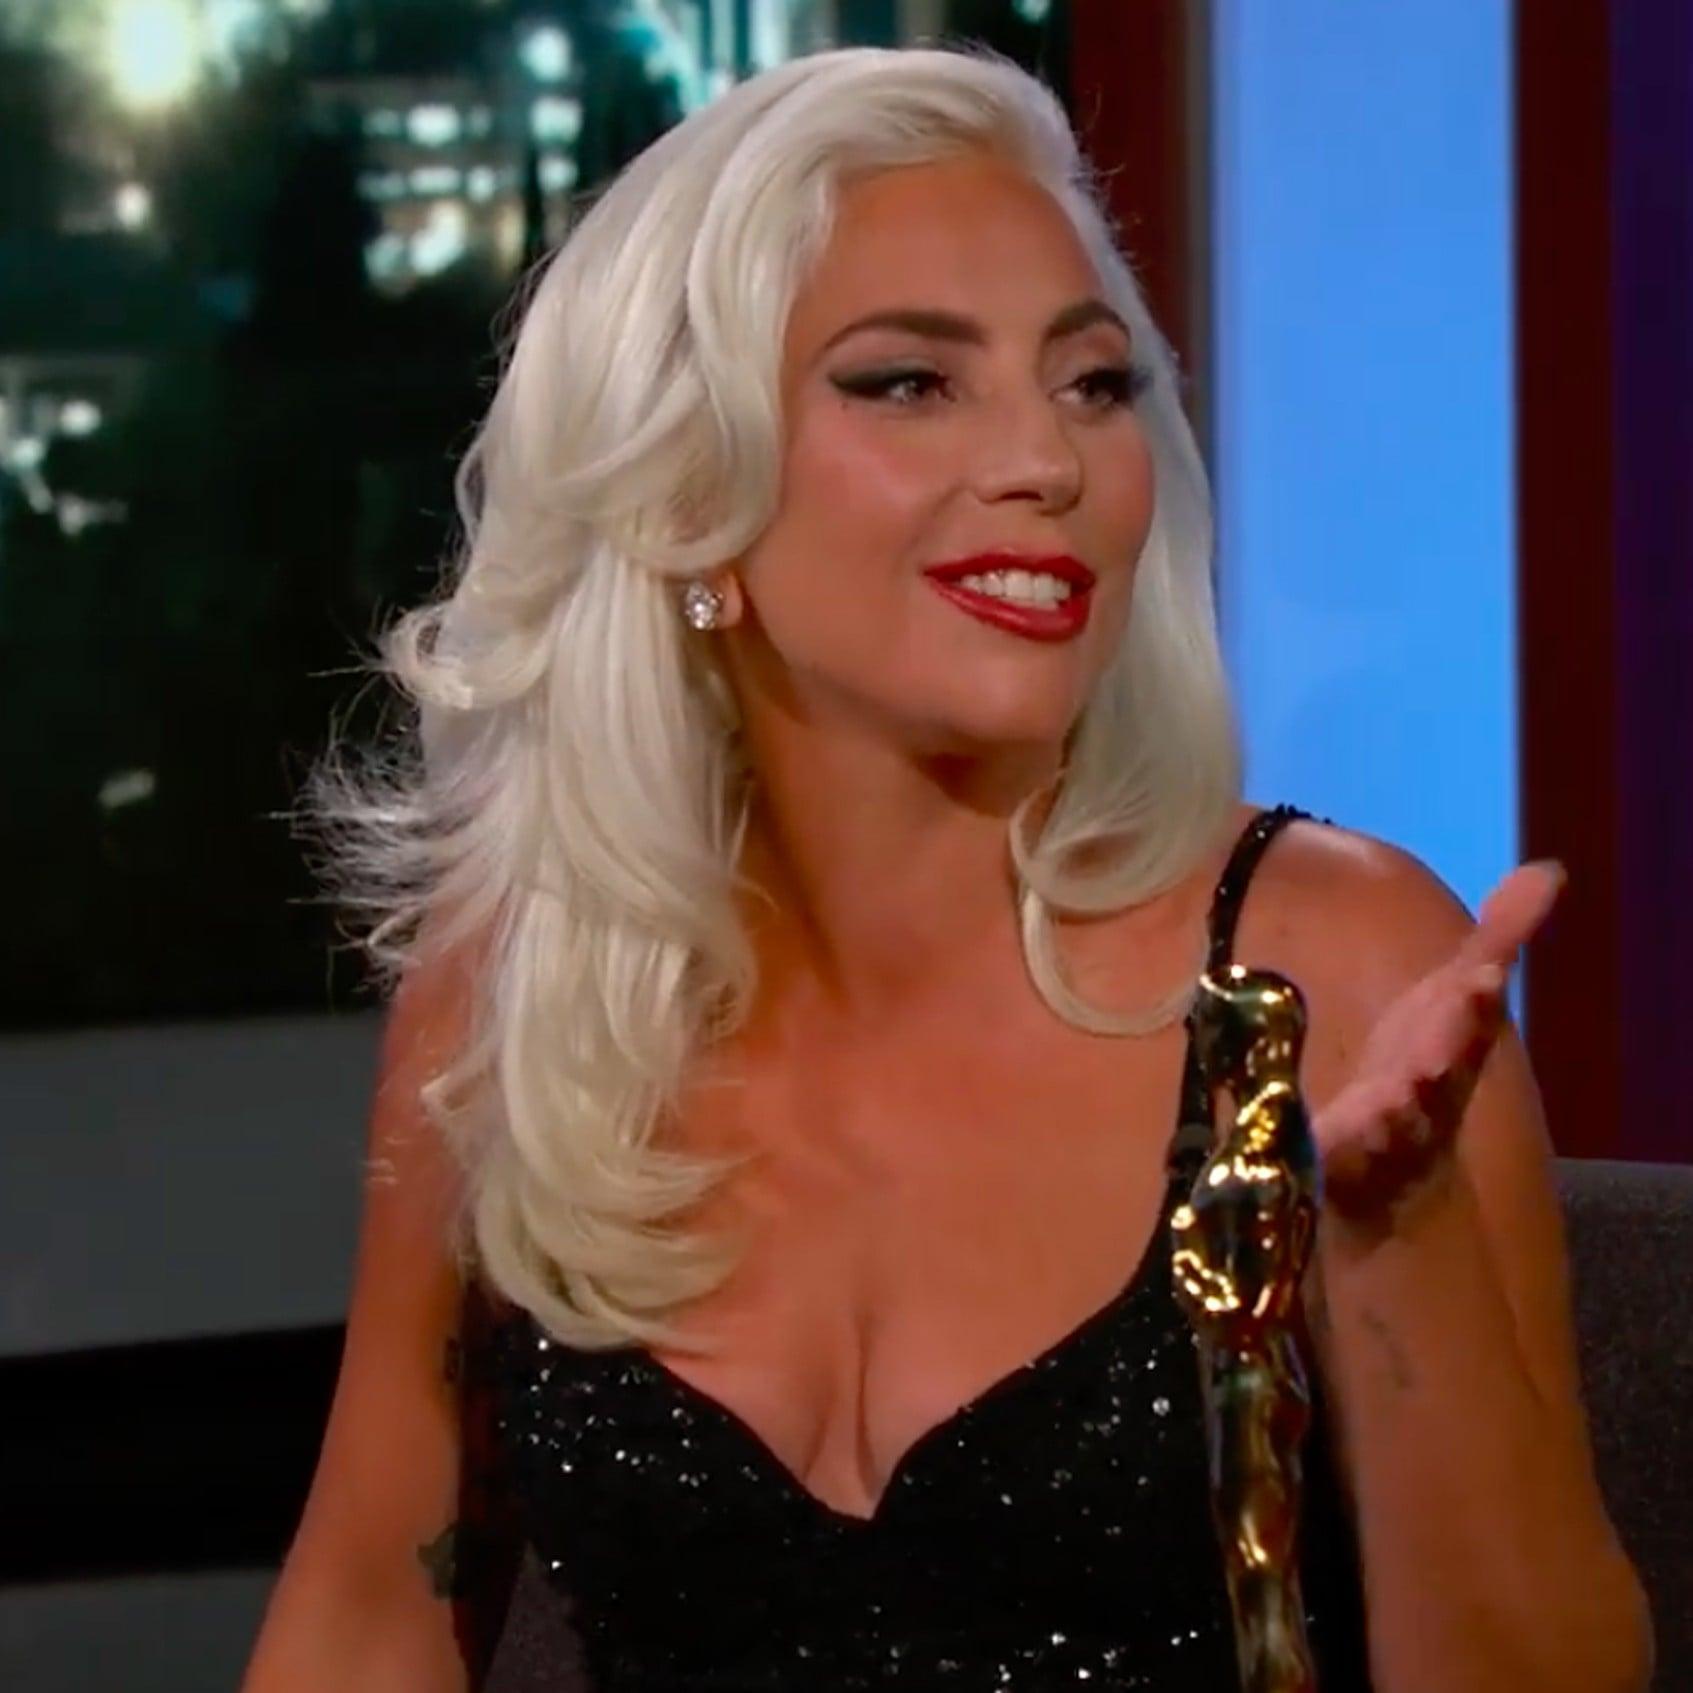 afaf79e1a0 Lady Gaga on Jimmy Kimmel Live Feb. 2019 Video